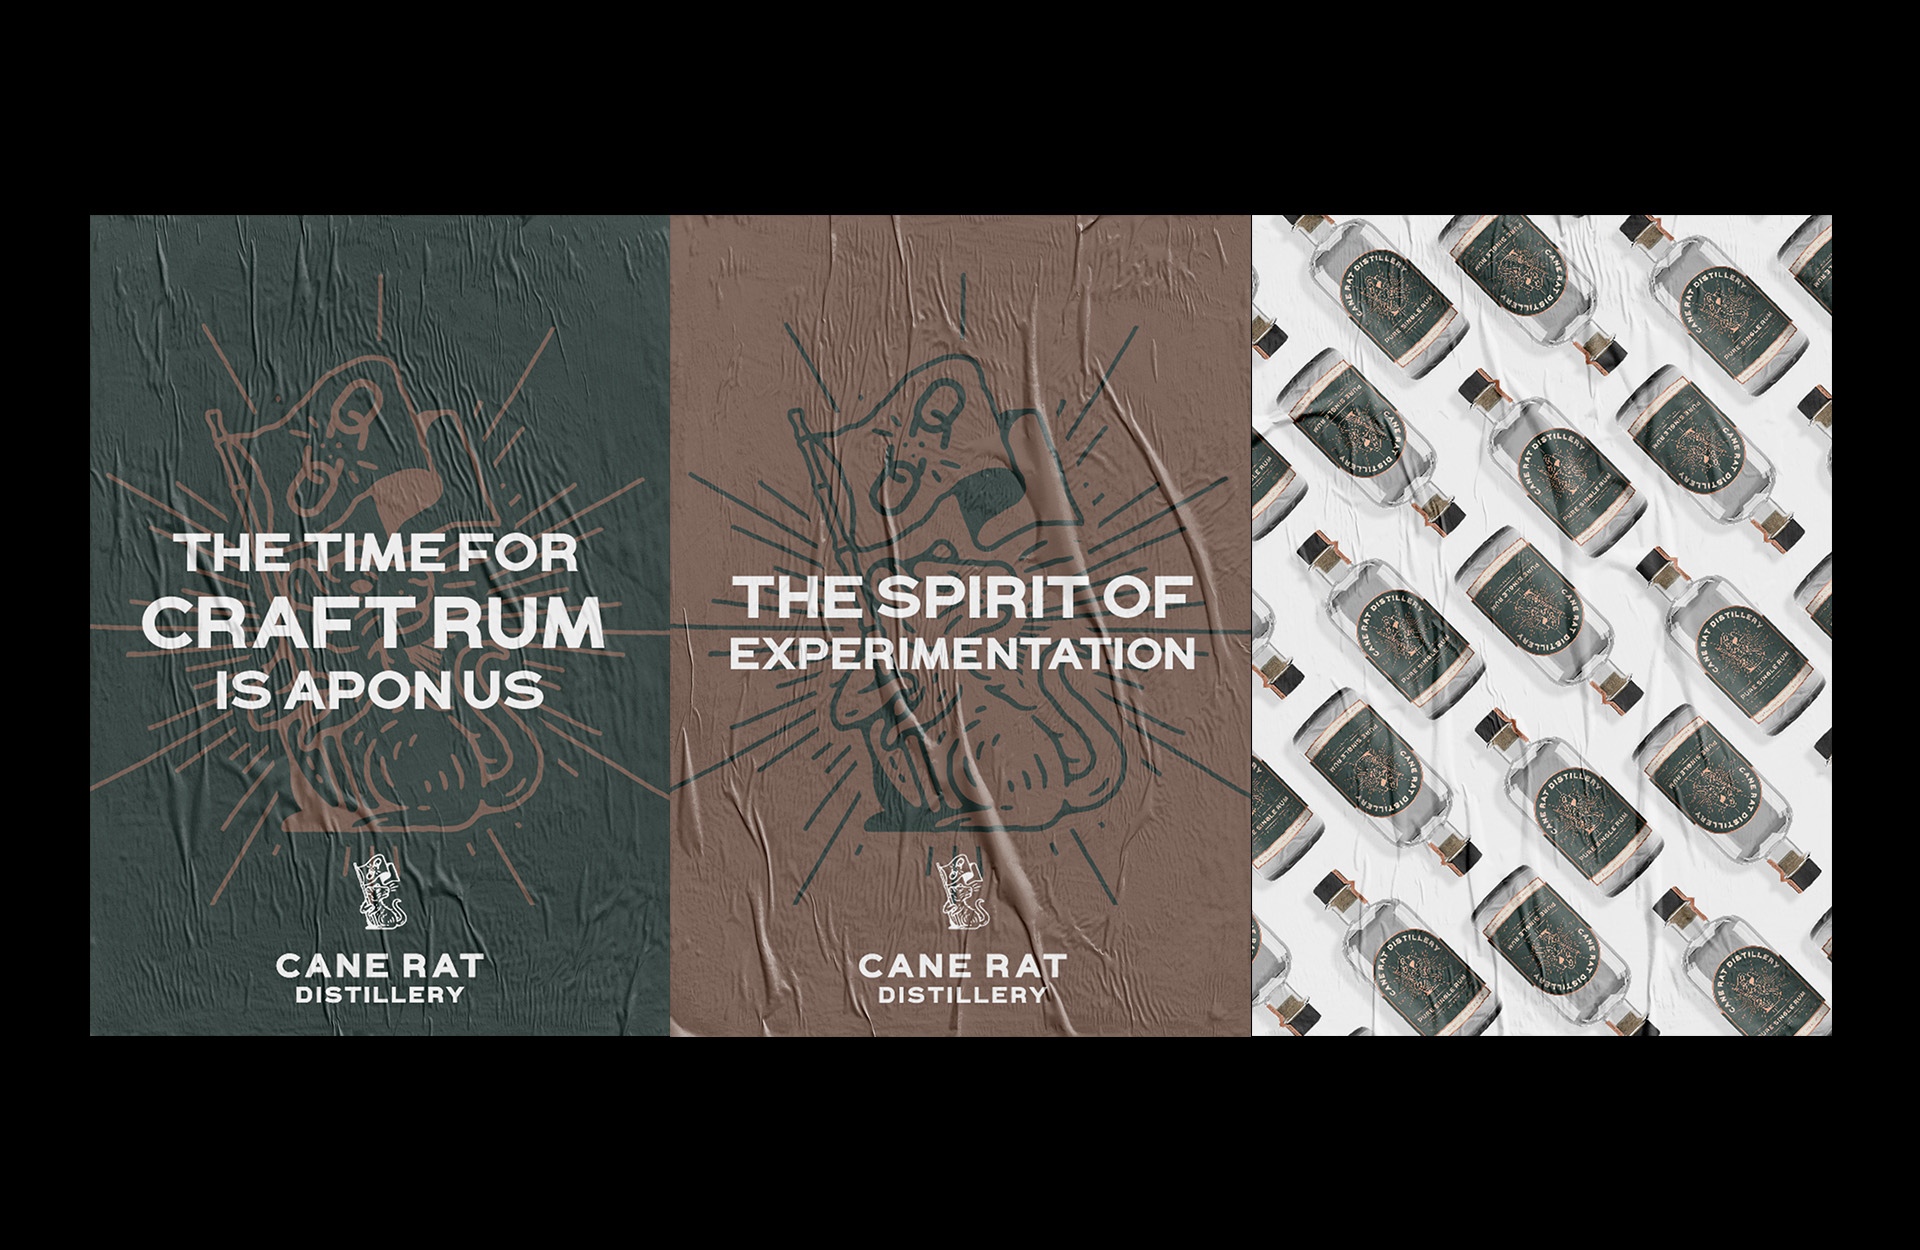 Cane Rat Distillery - Never Know Defeat